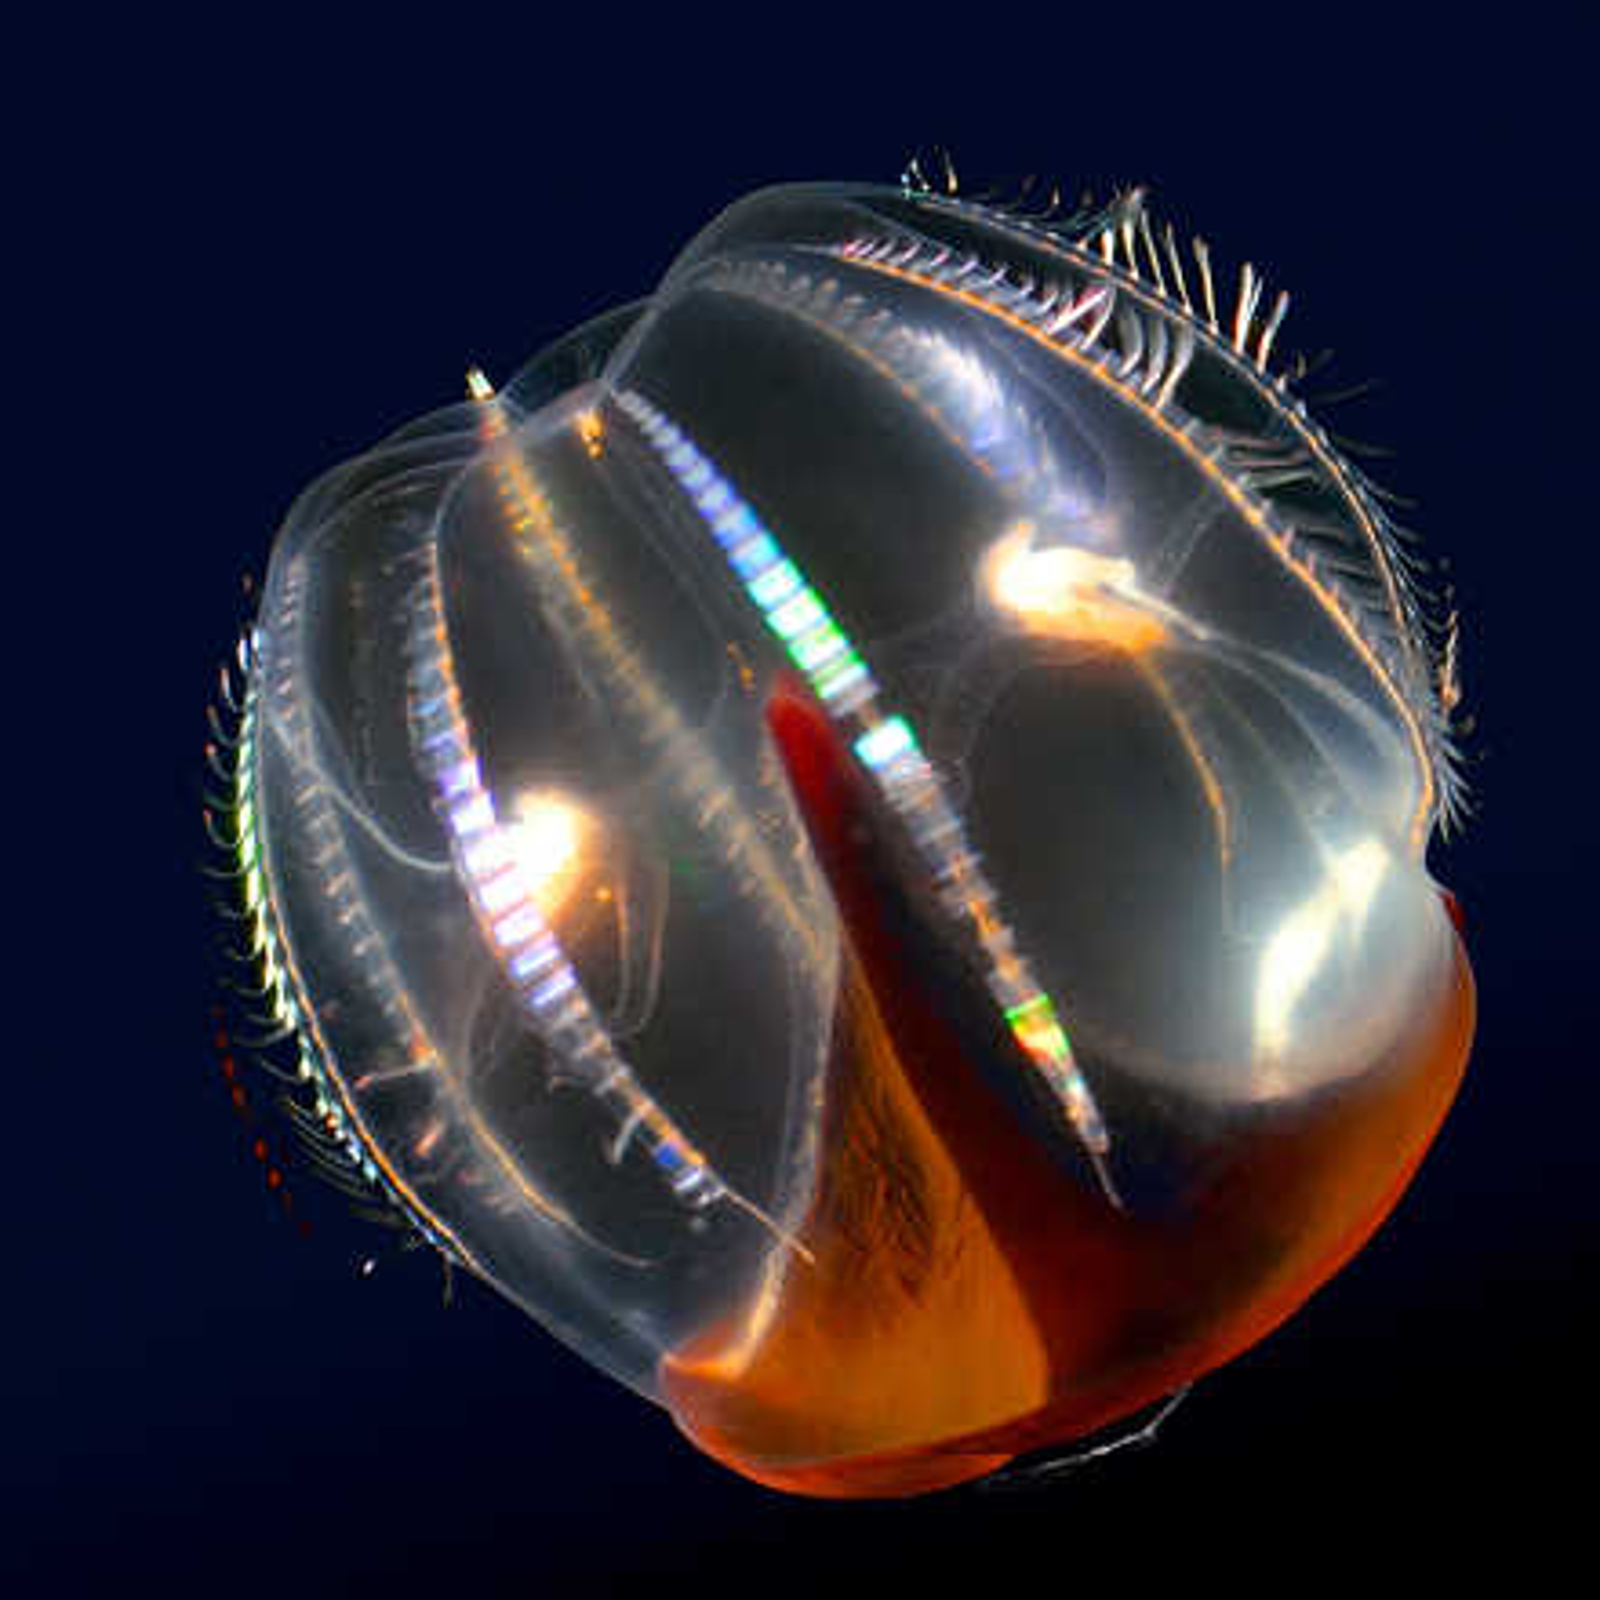 Hidden ocean 7 Cydippid ctenophore - Kevin  Raskoff